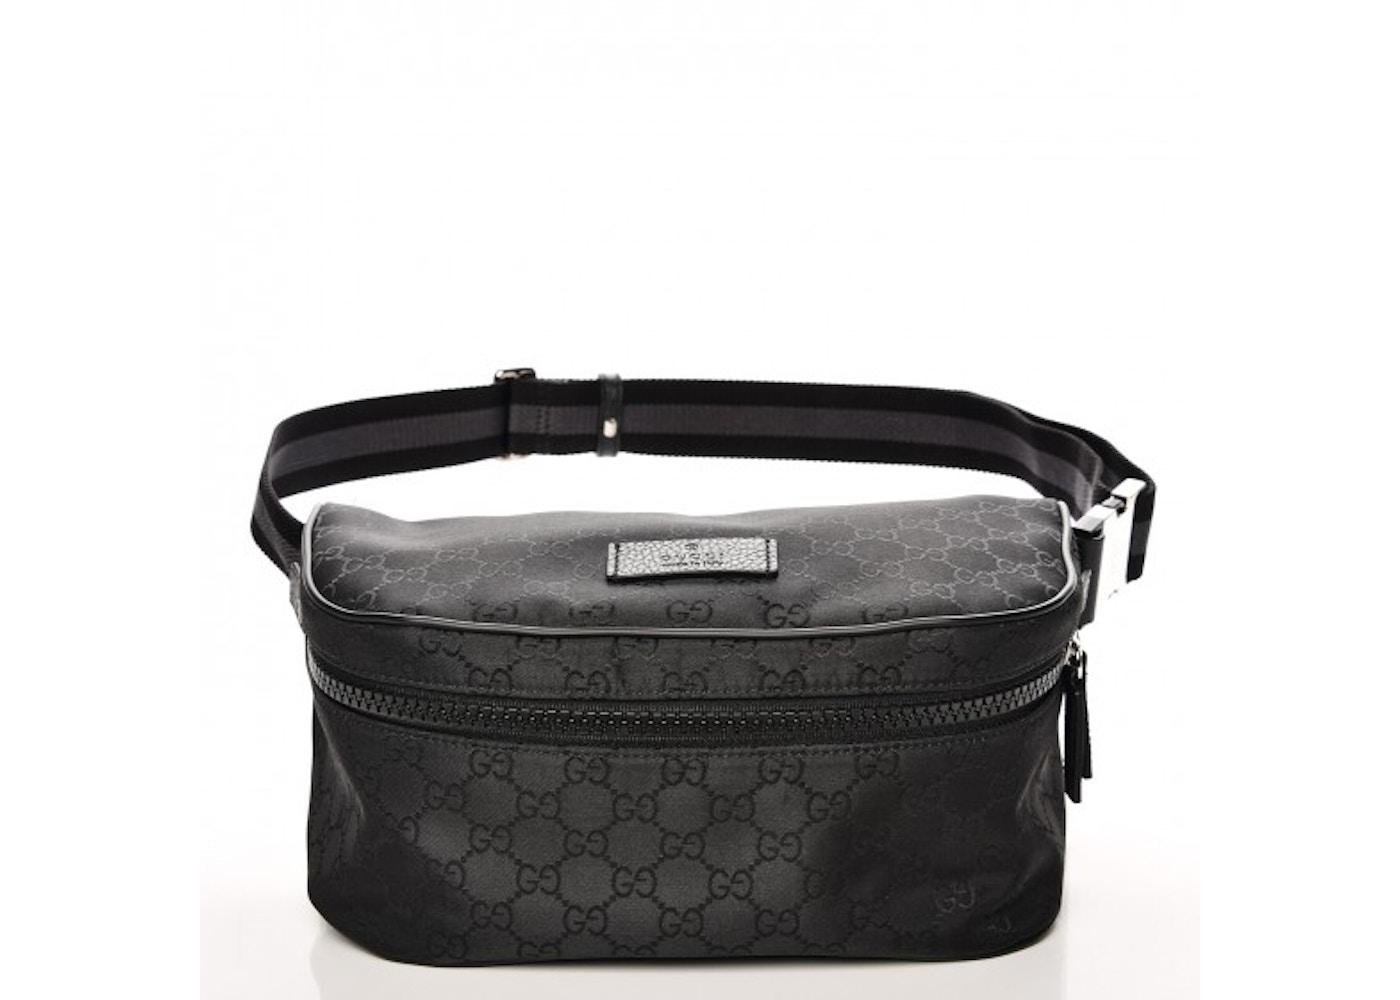 8c70a9806b8 Gucci Fanny Pack Belt Bag Monogram GG Black